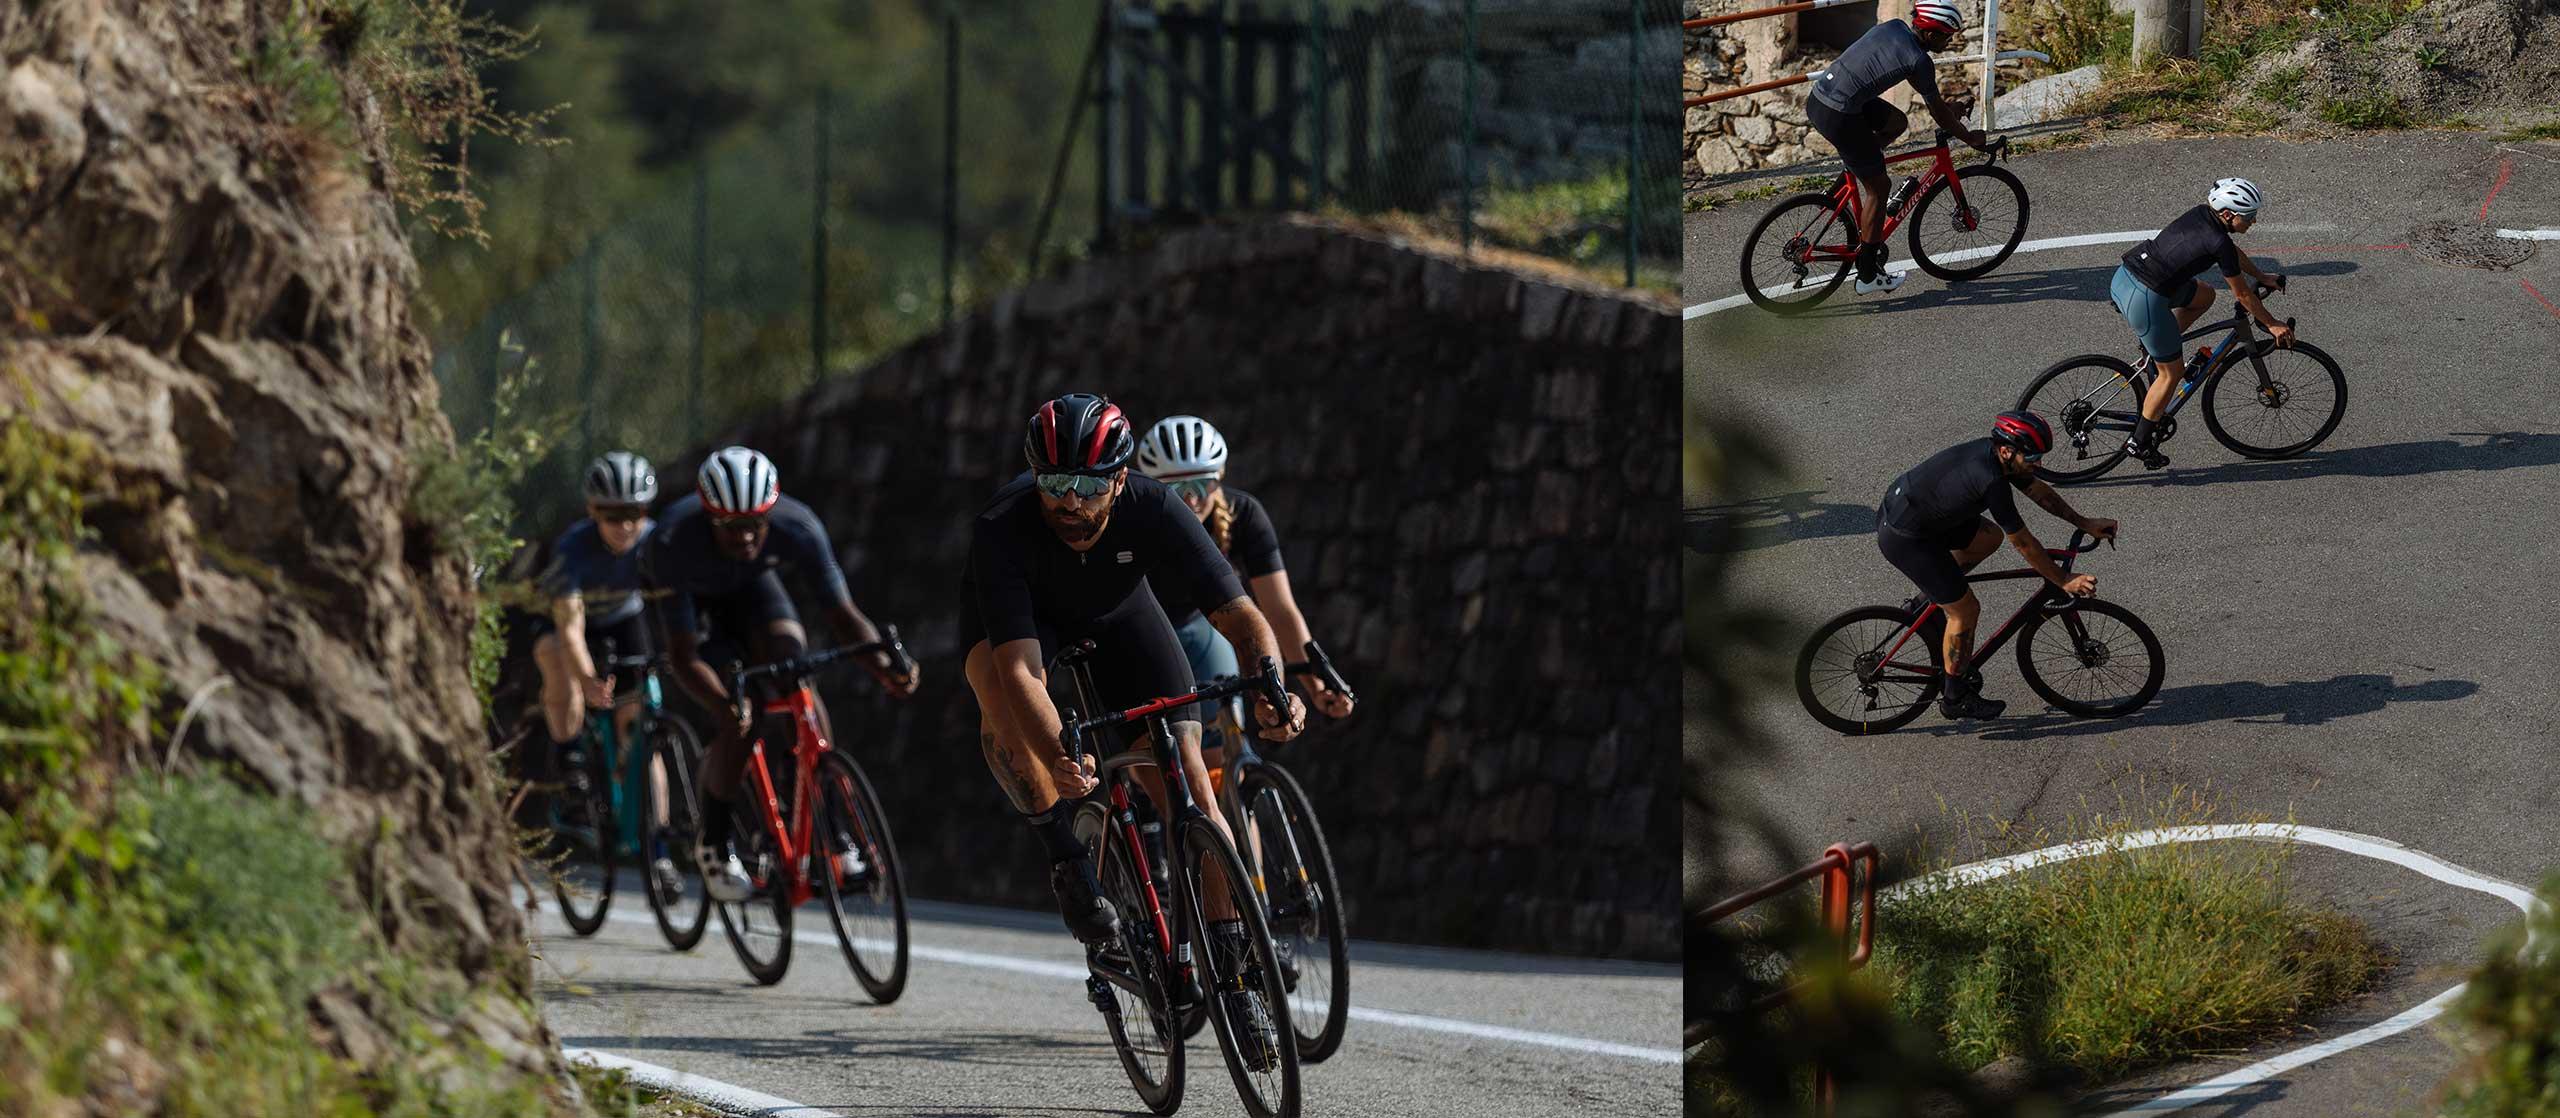 MET Helmets Specialists in road cycling helmets